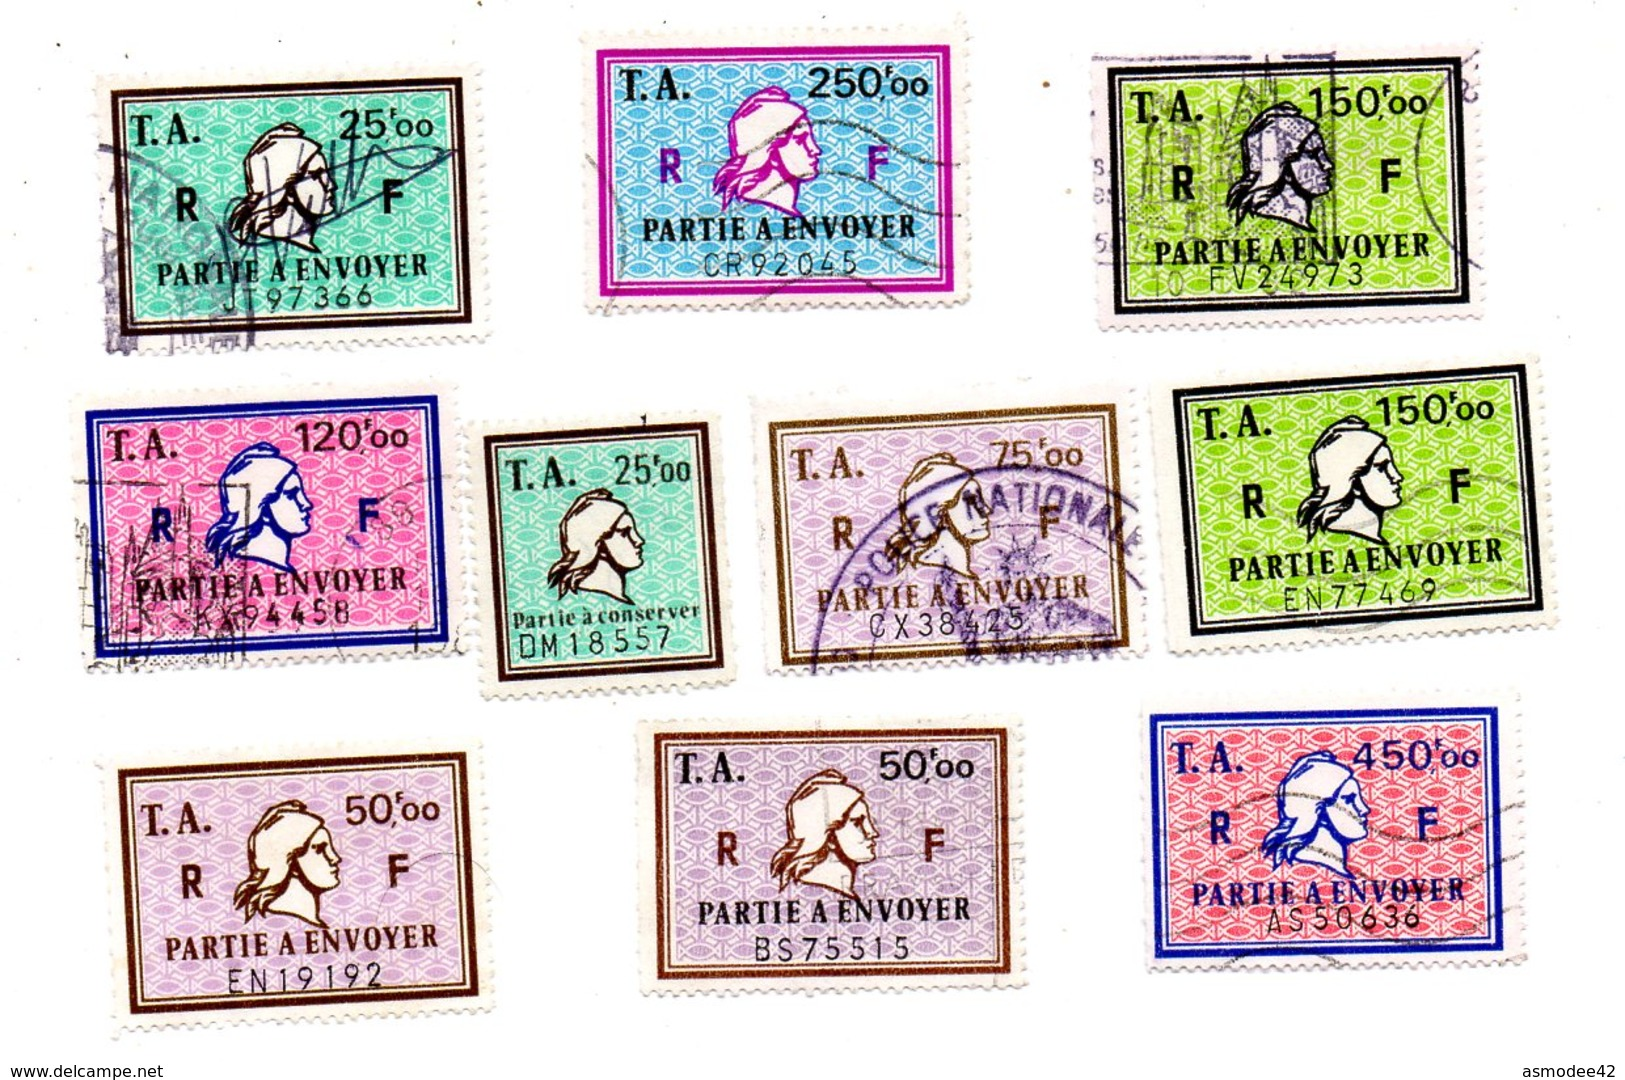 fiscaux france timbres amendes lot de 10 timbres fiscaux h 21. Black Bedroom Furniture Sets. Home Design Ideas